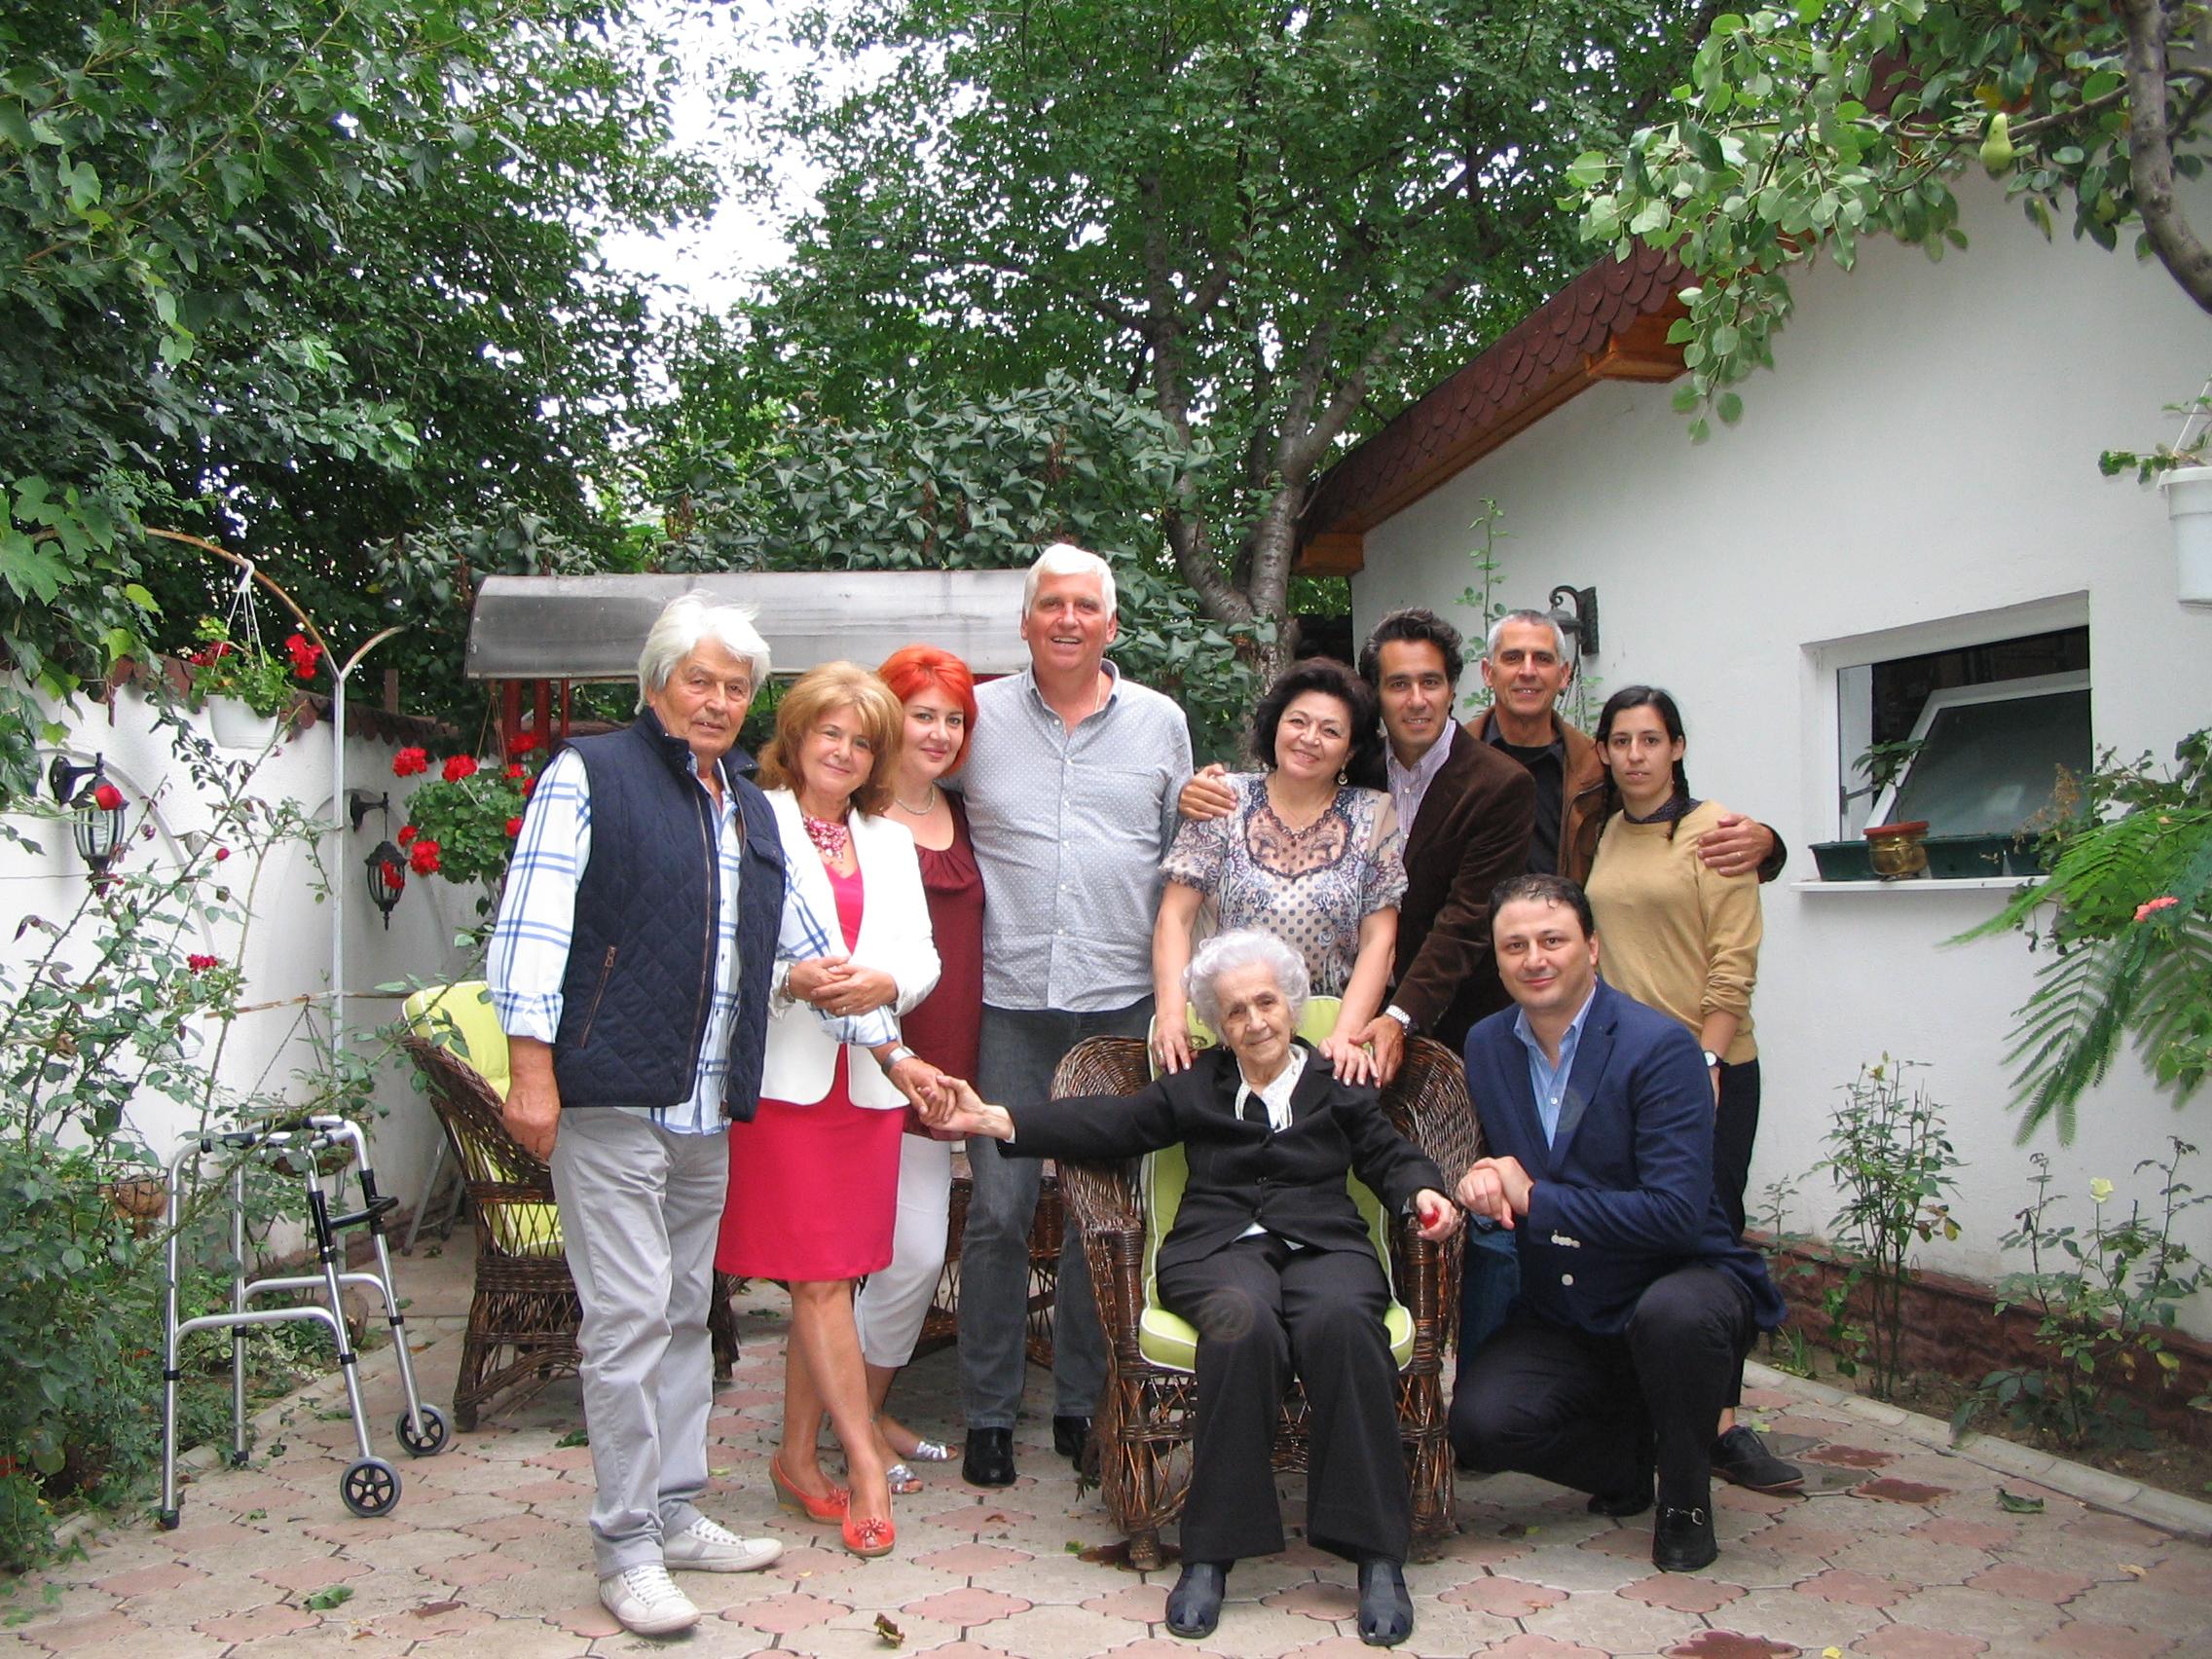 [a portion of] The Celibidache Family